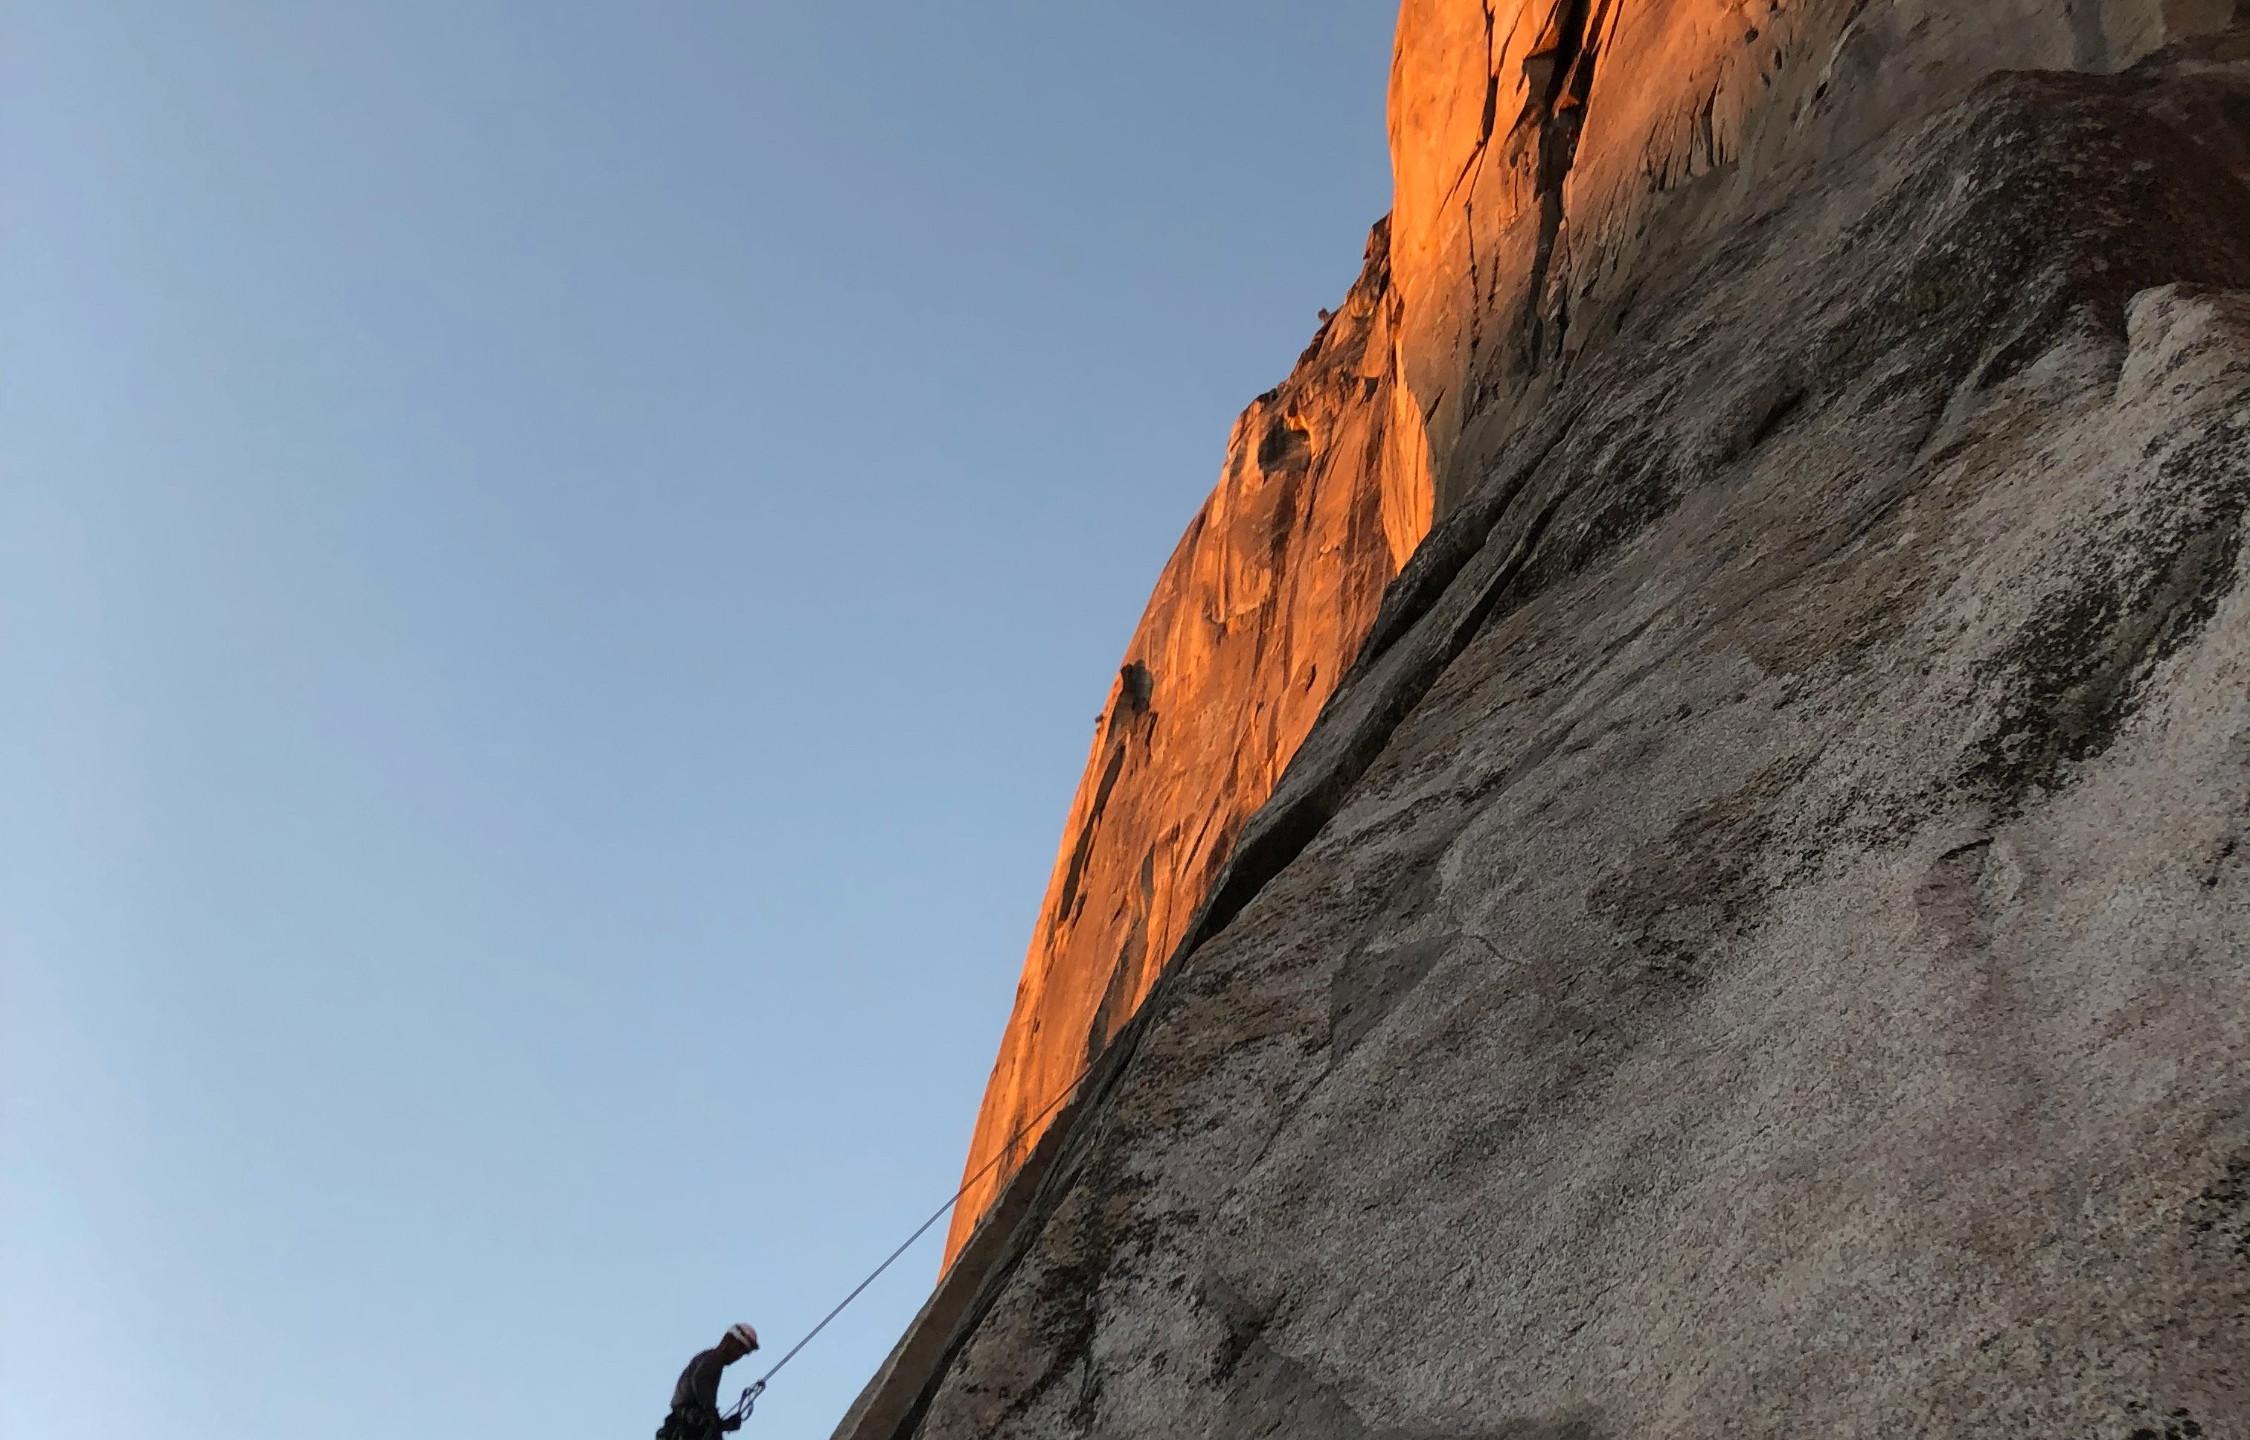 Descending